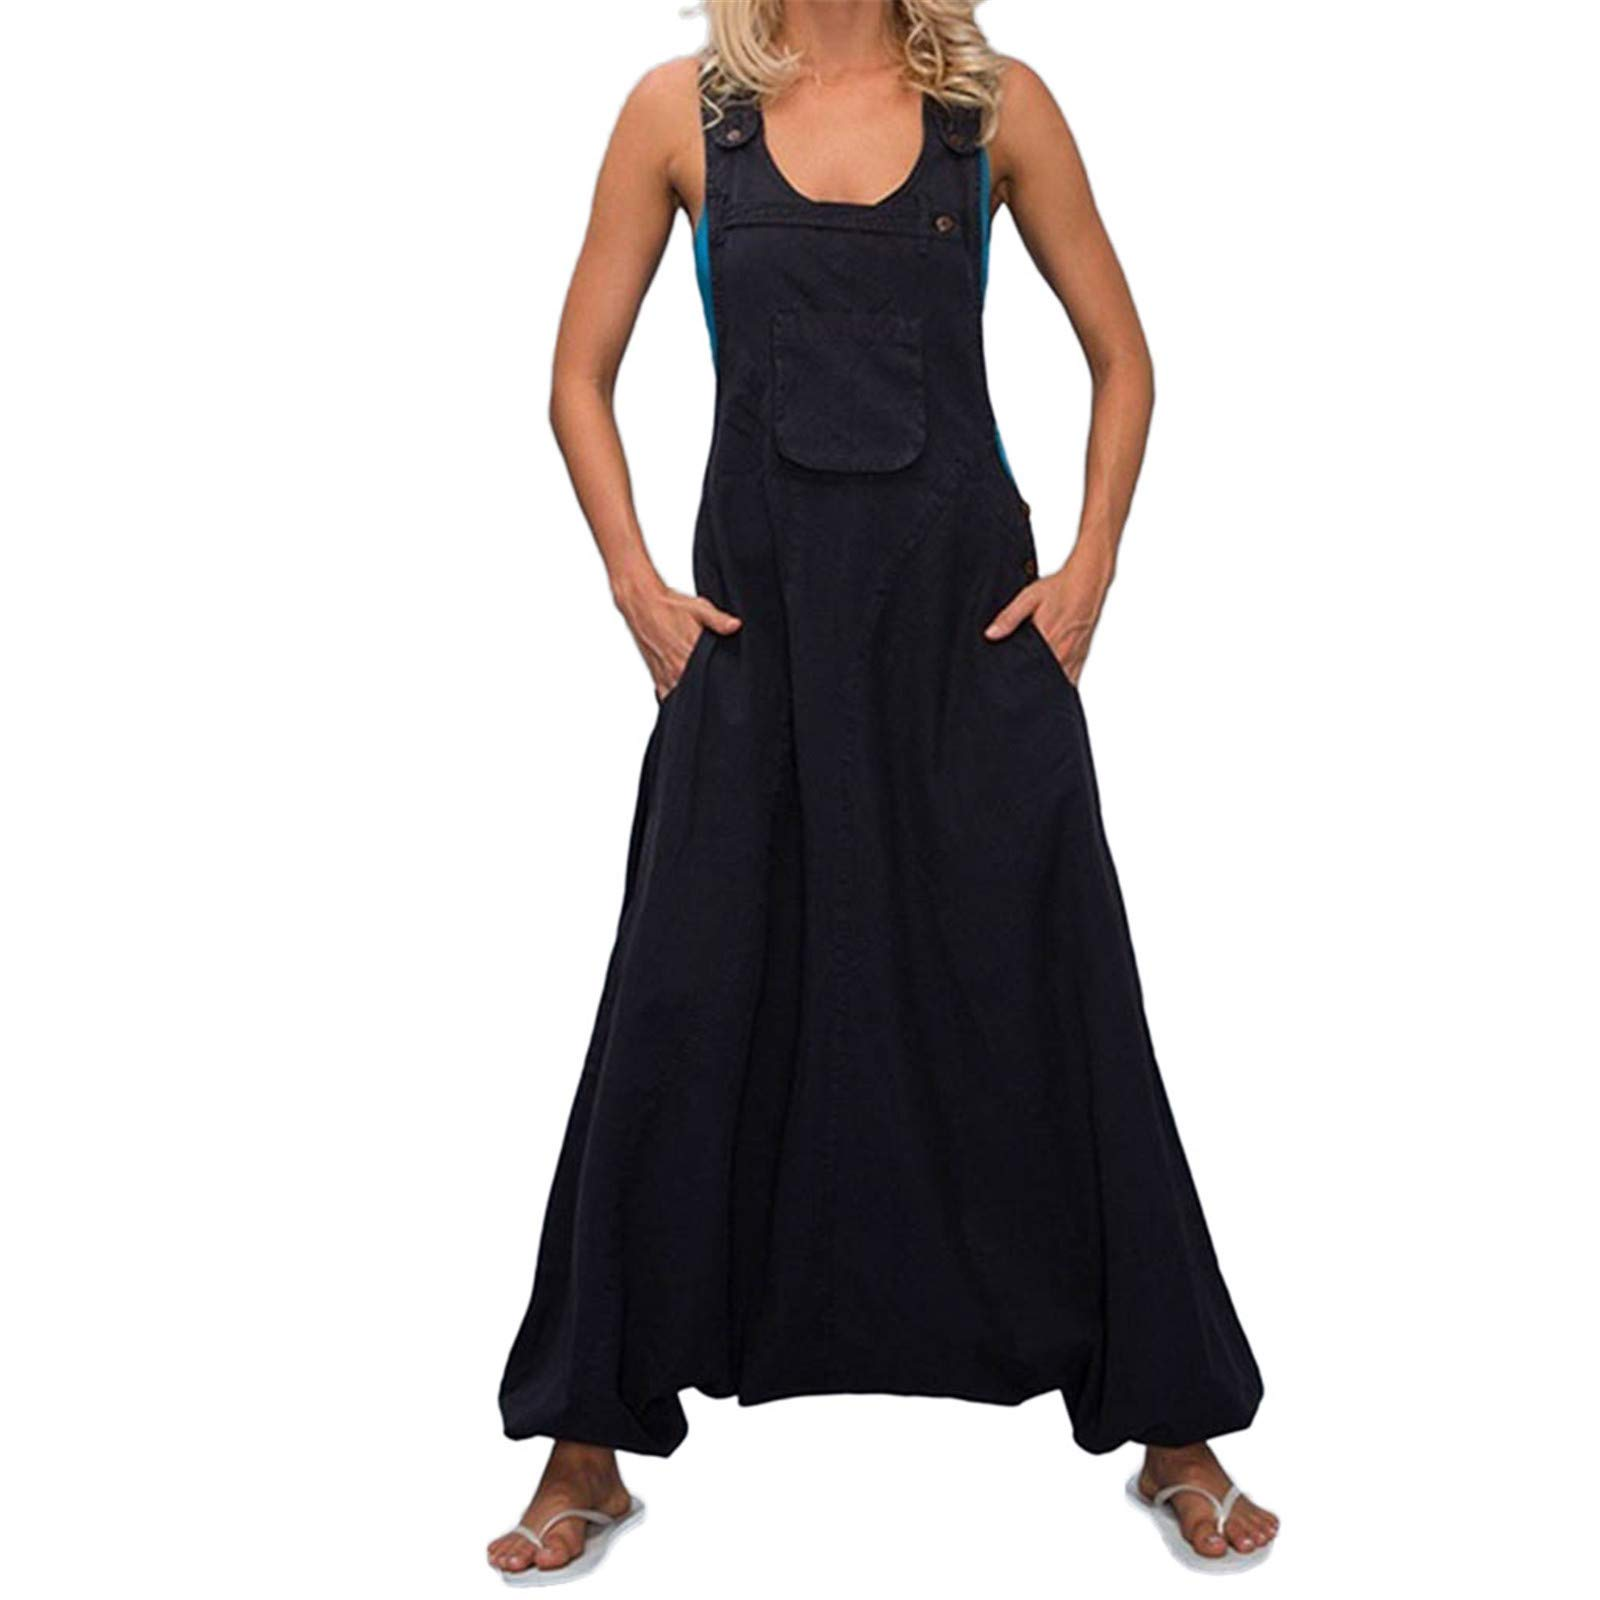 Thenxin Plus Size Womens Overalls U Neck Sleeveless Racerback Side Pockets Baggy Long Jumpsuits(Black,XXXXXL)